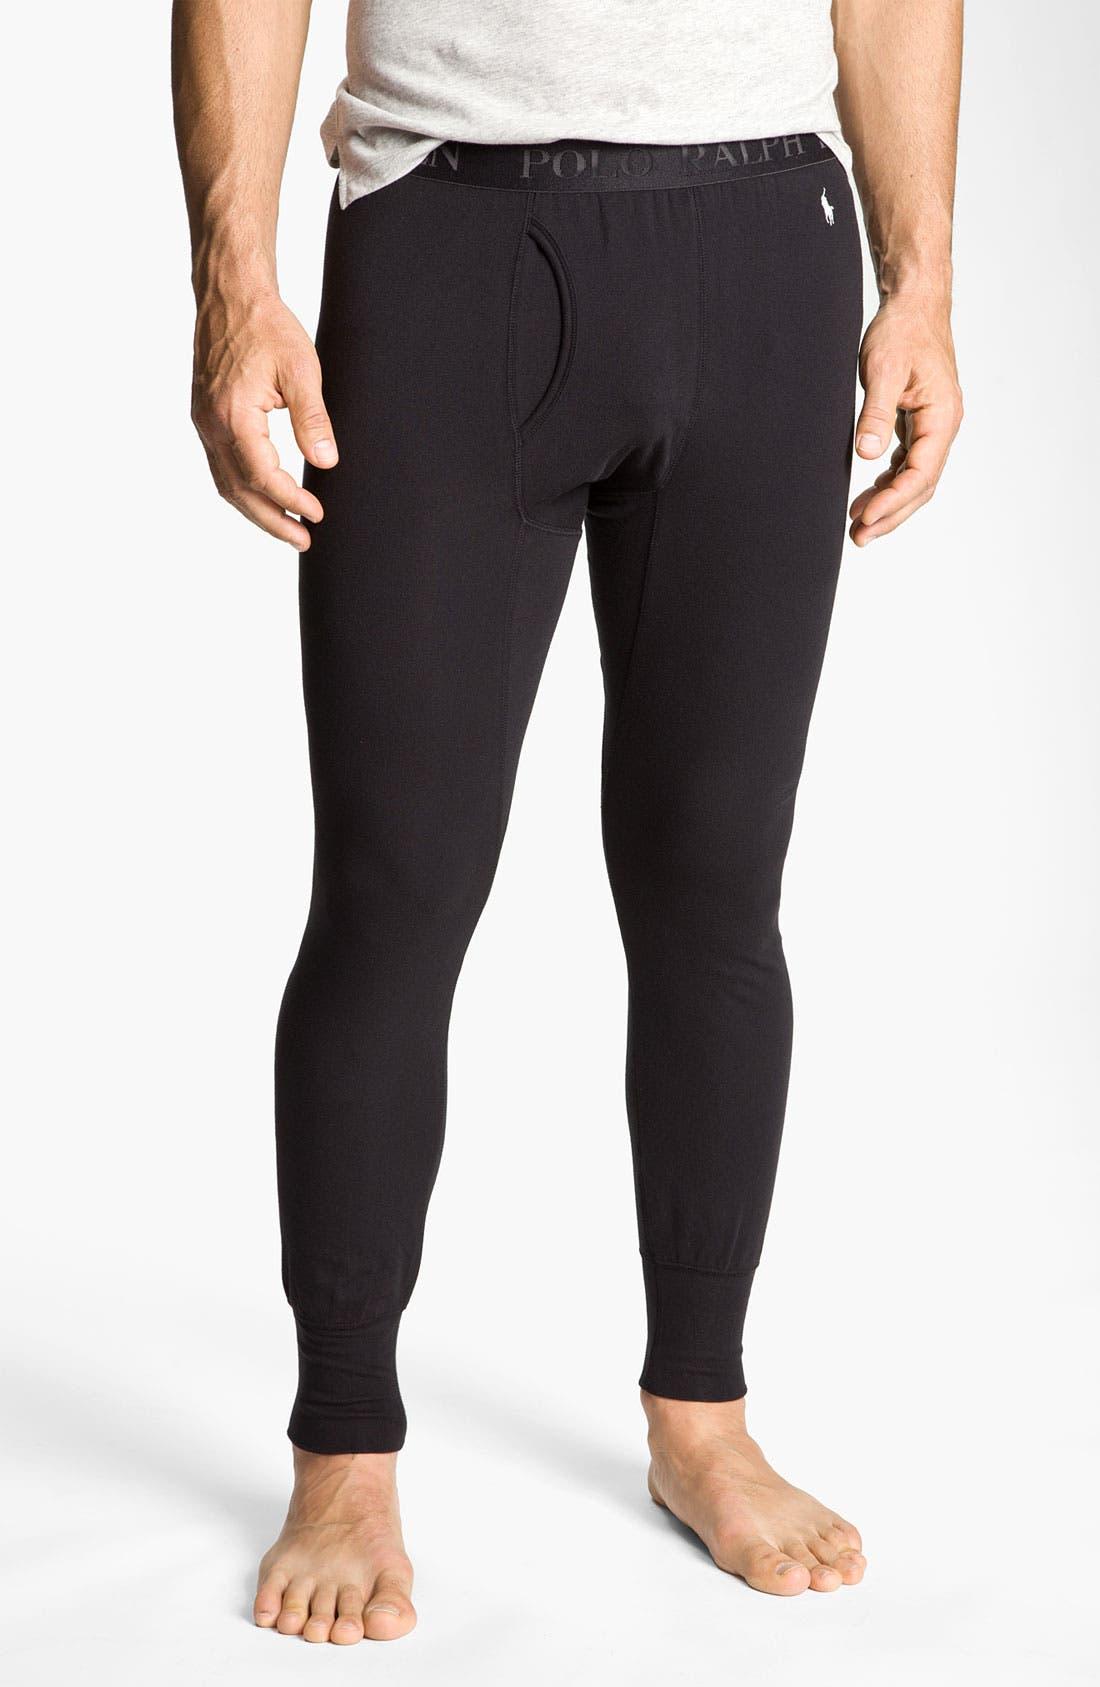 Main Image - Polo Ralph Lauren Stretch Cotton Long Underwear